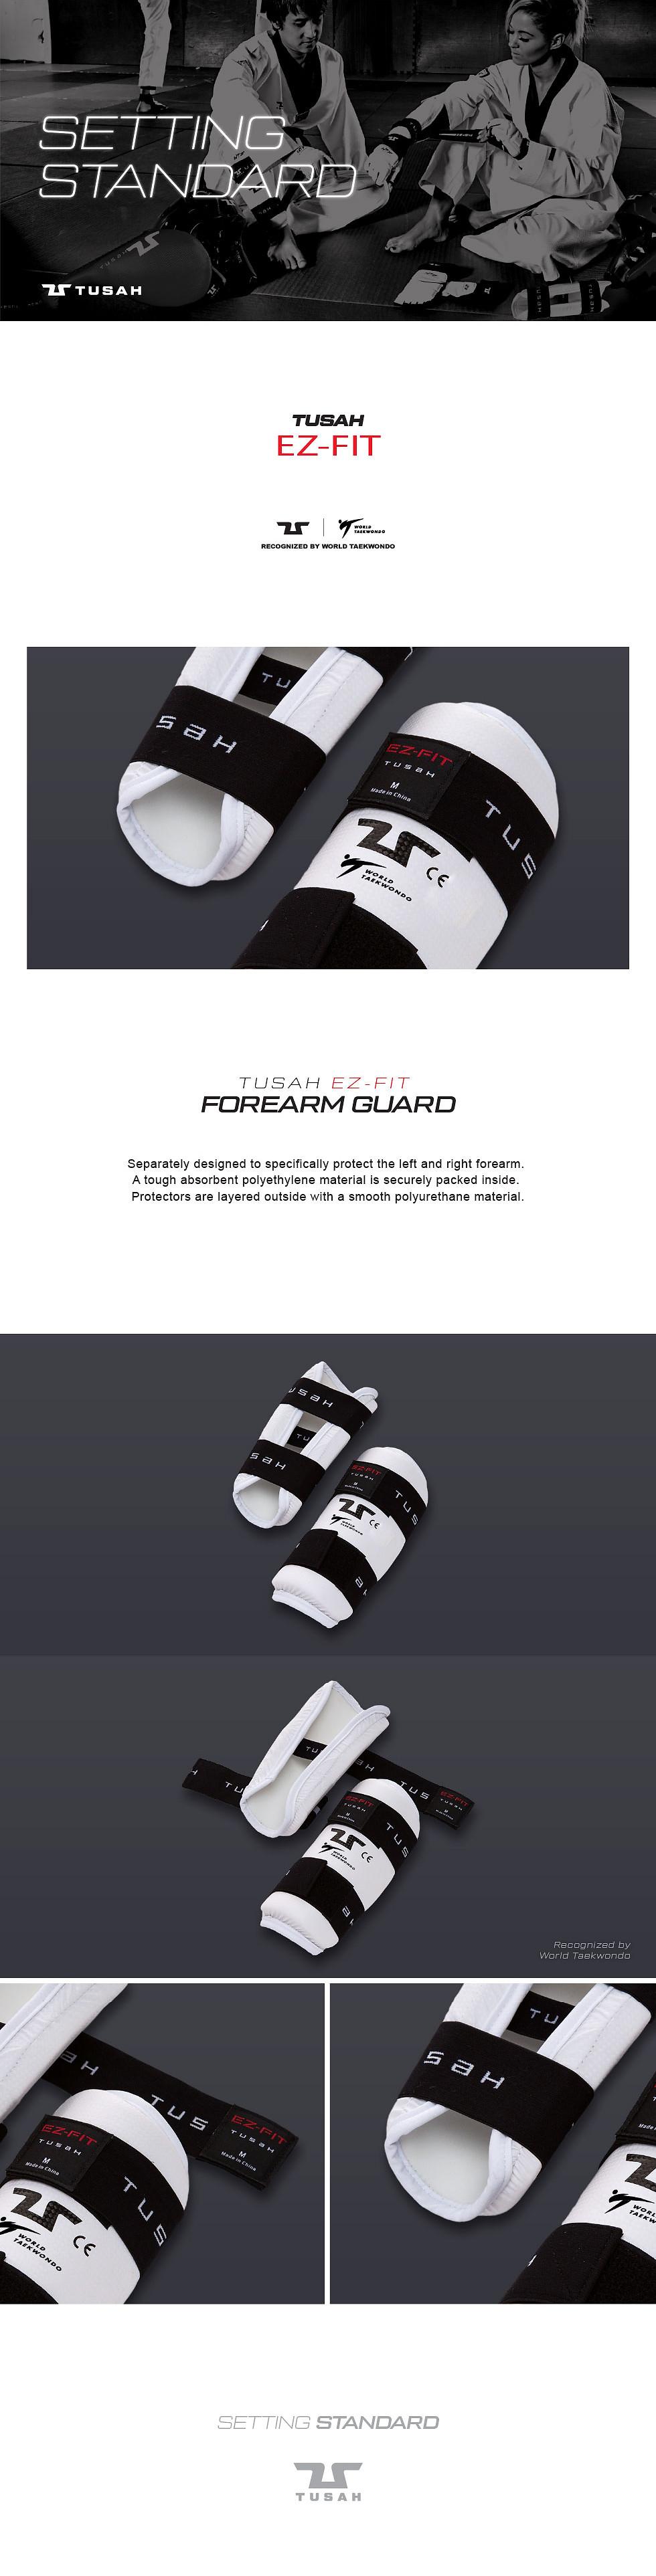 sparring-forearmguard1.jpg